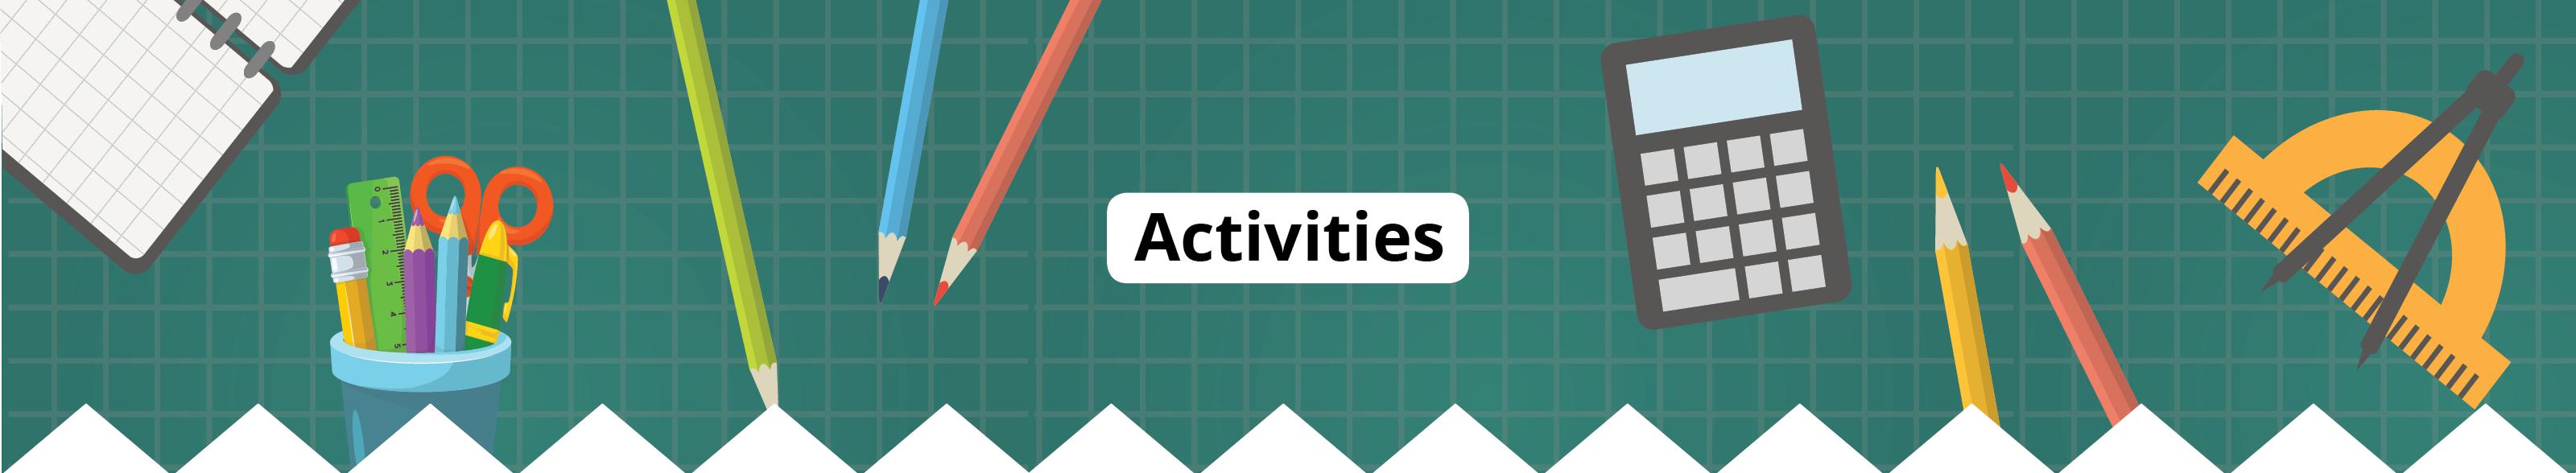 Natural Gas Activities